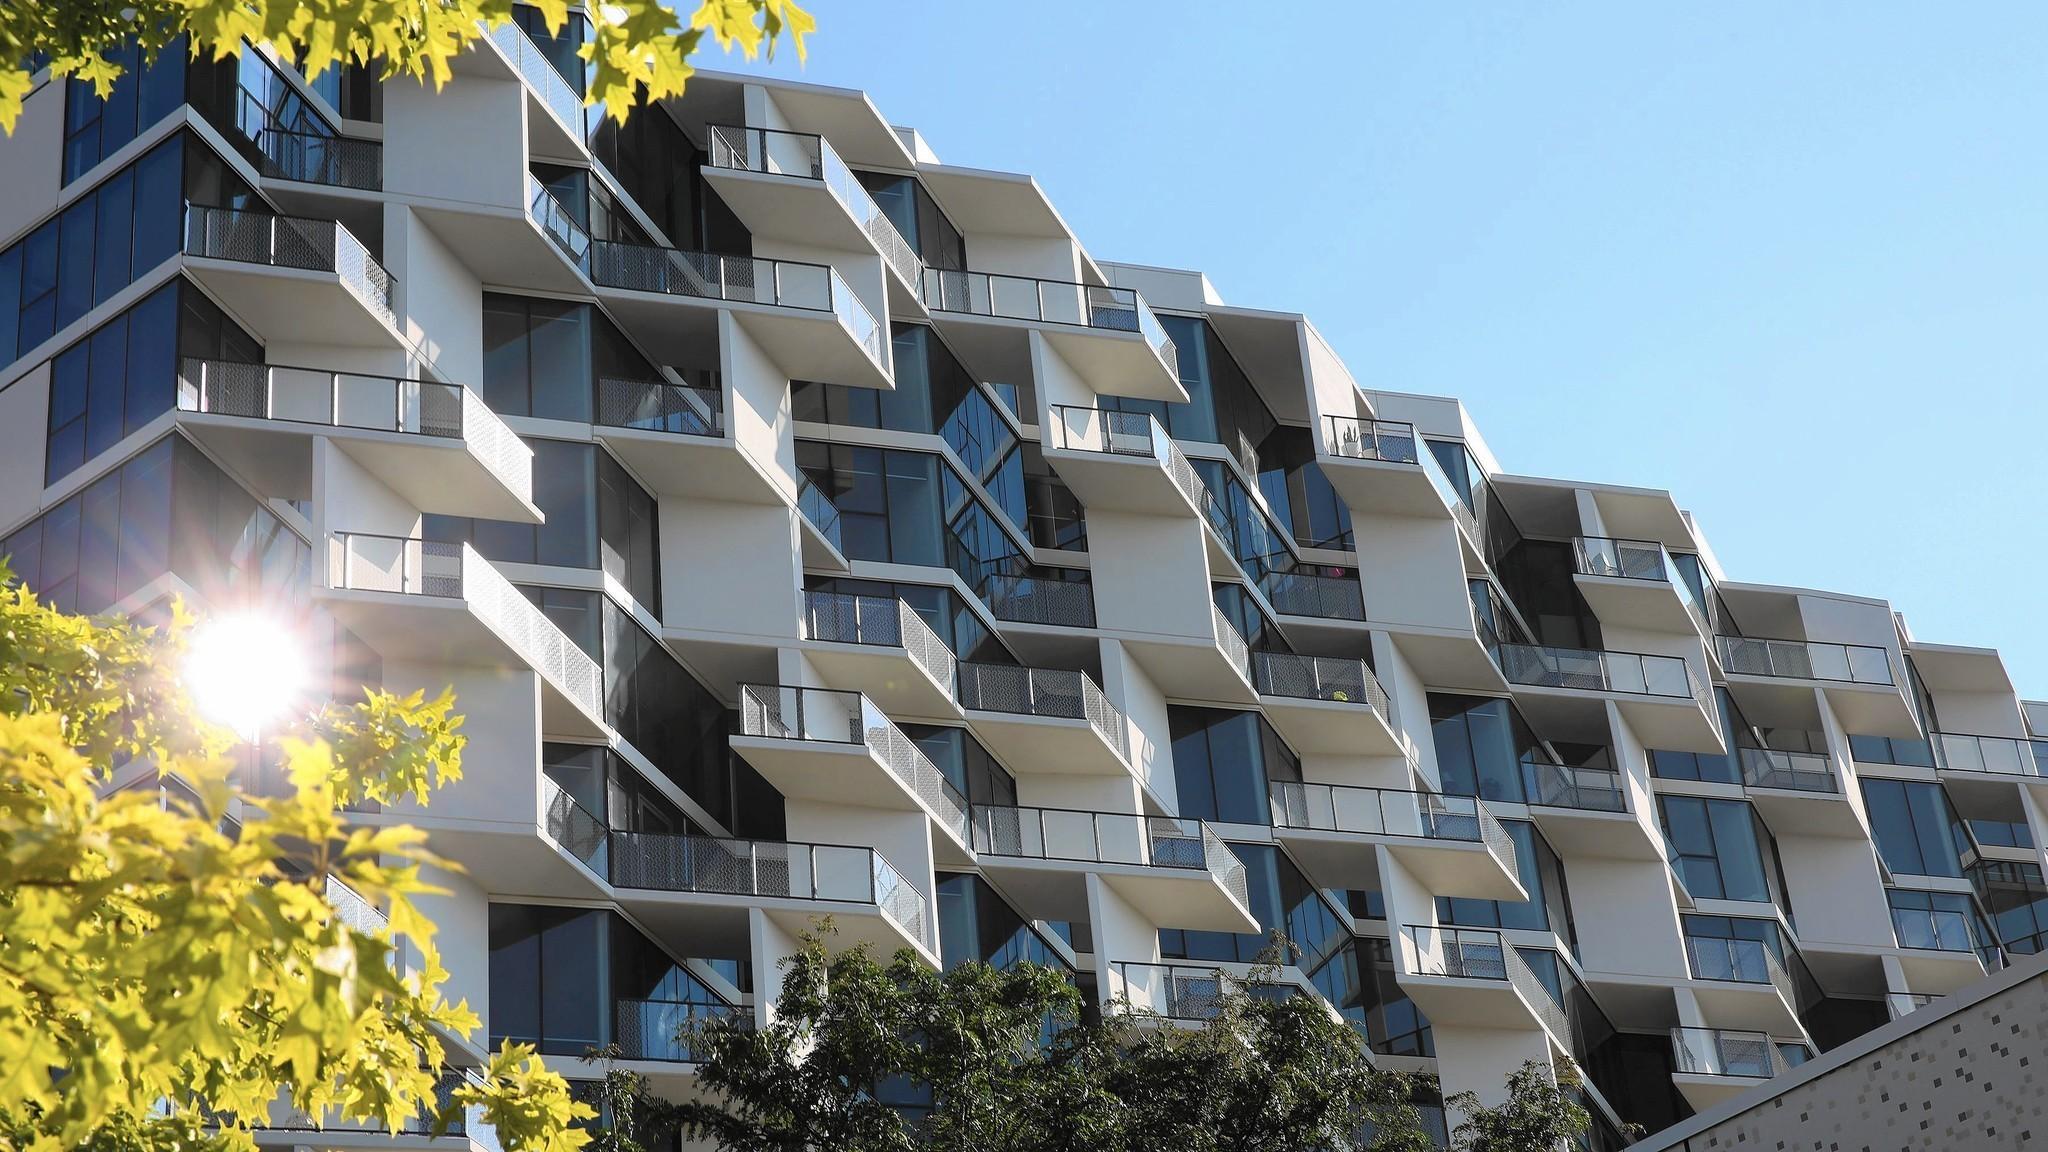 City Hyde Park High Rise Breaks Up Apartment Monotony